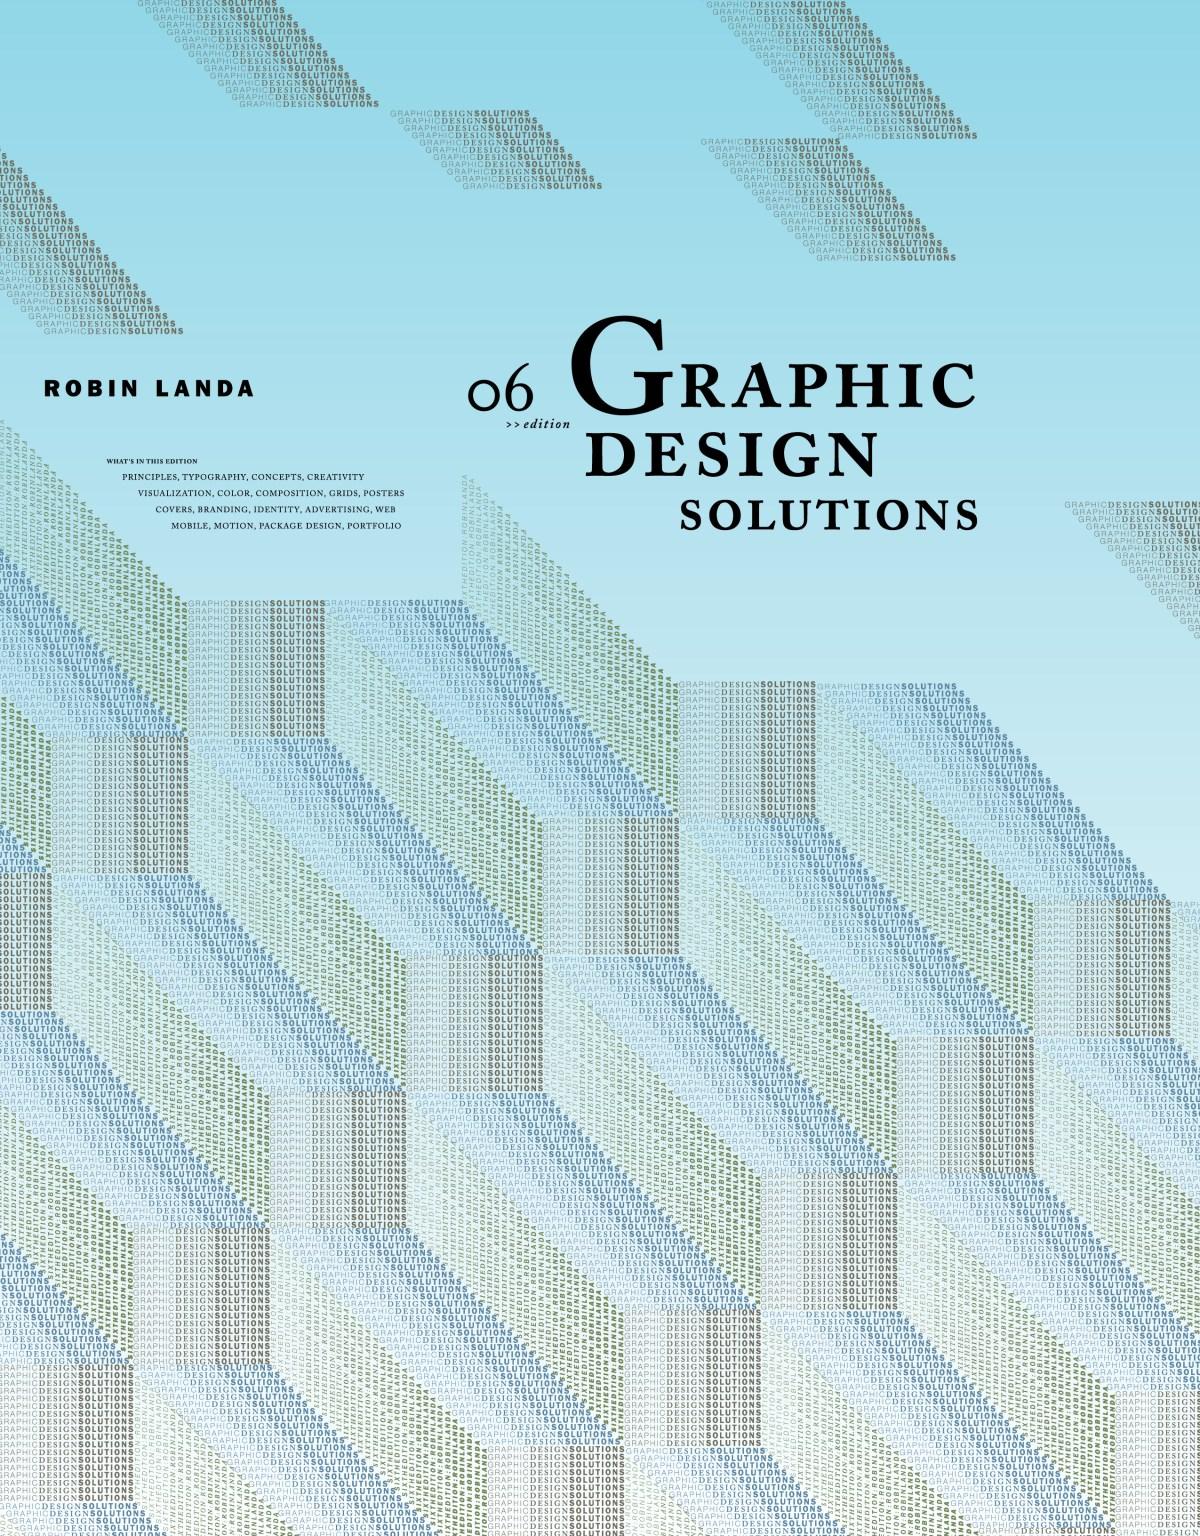 Robin Landa's 6th Edition of Graphic Design Solutions